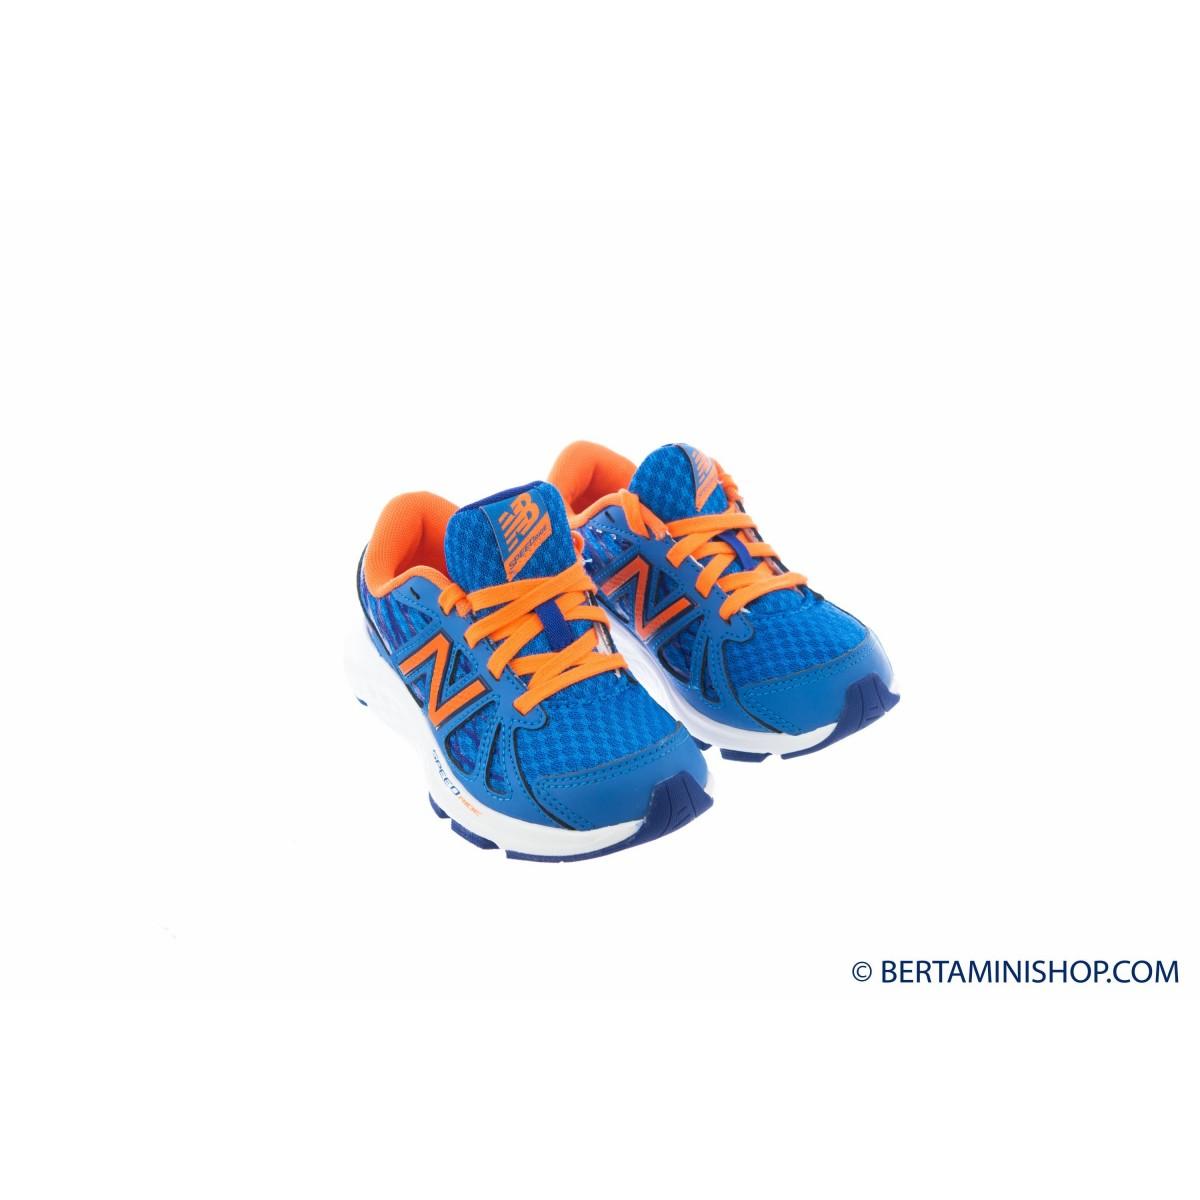 Schuhen New Balance Kid's - KJ690 Pre Scool PT - Bluette